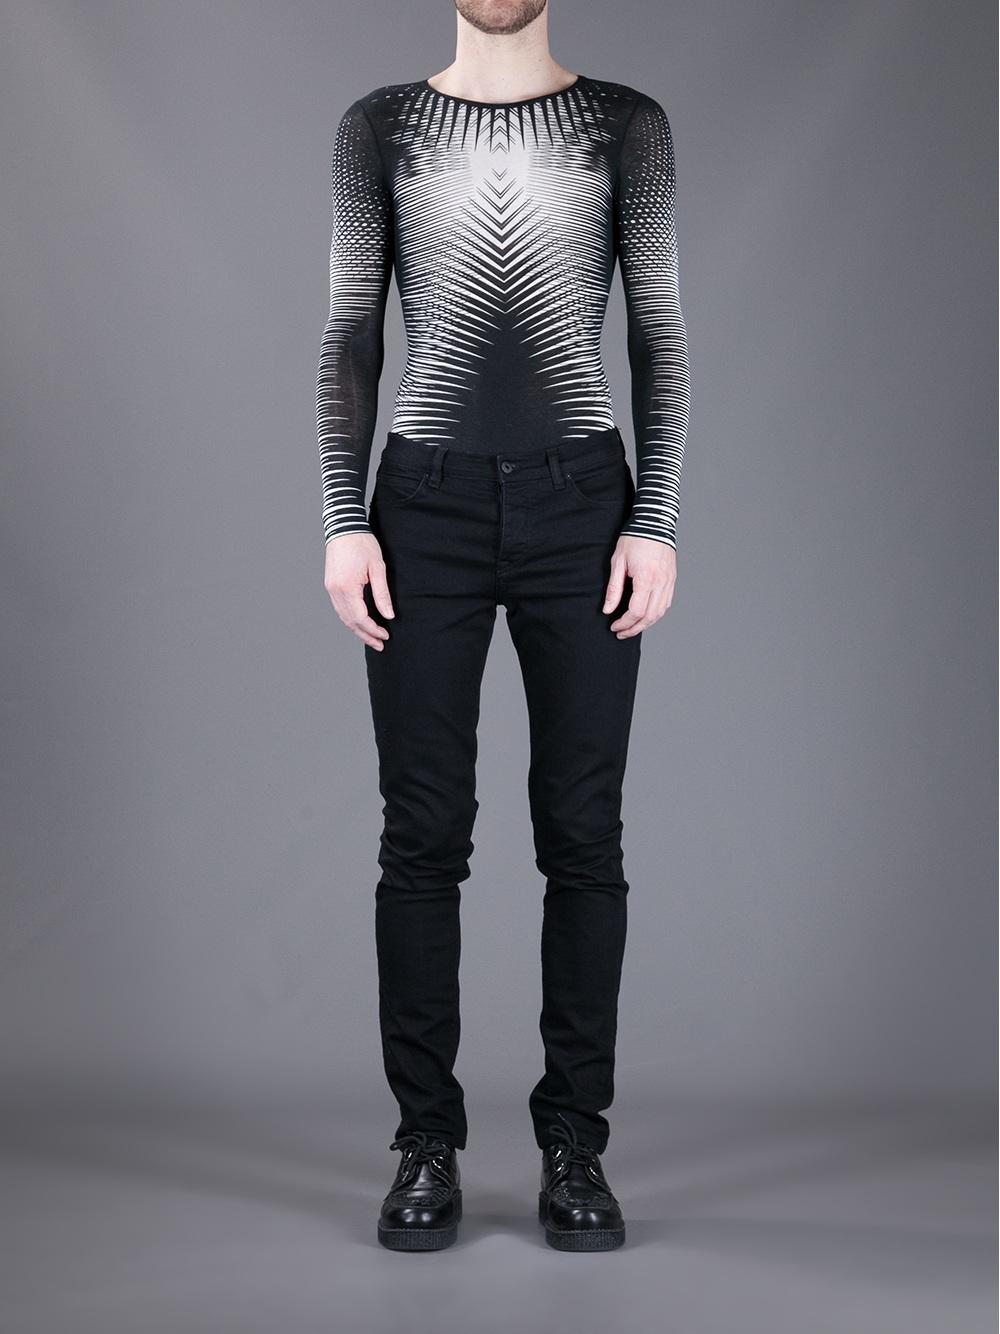 Gareth Pugh Big Ass Print Body In Black For Men  Lyst-3631